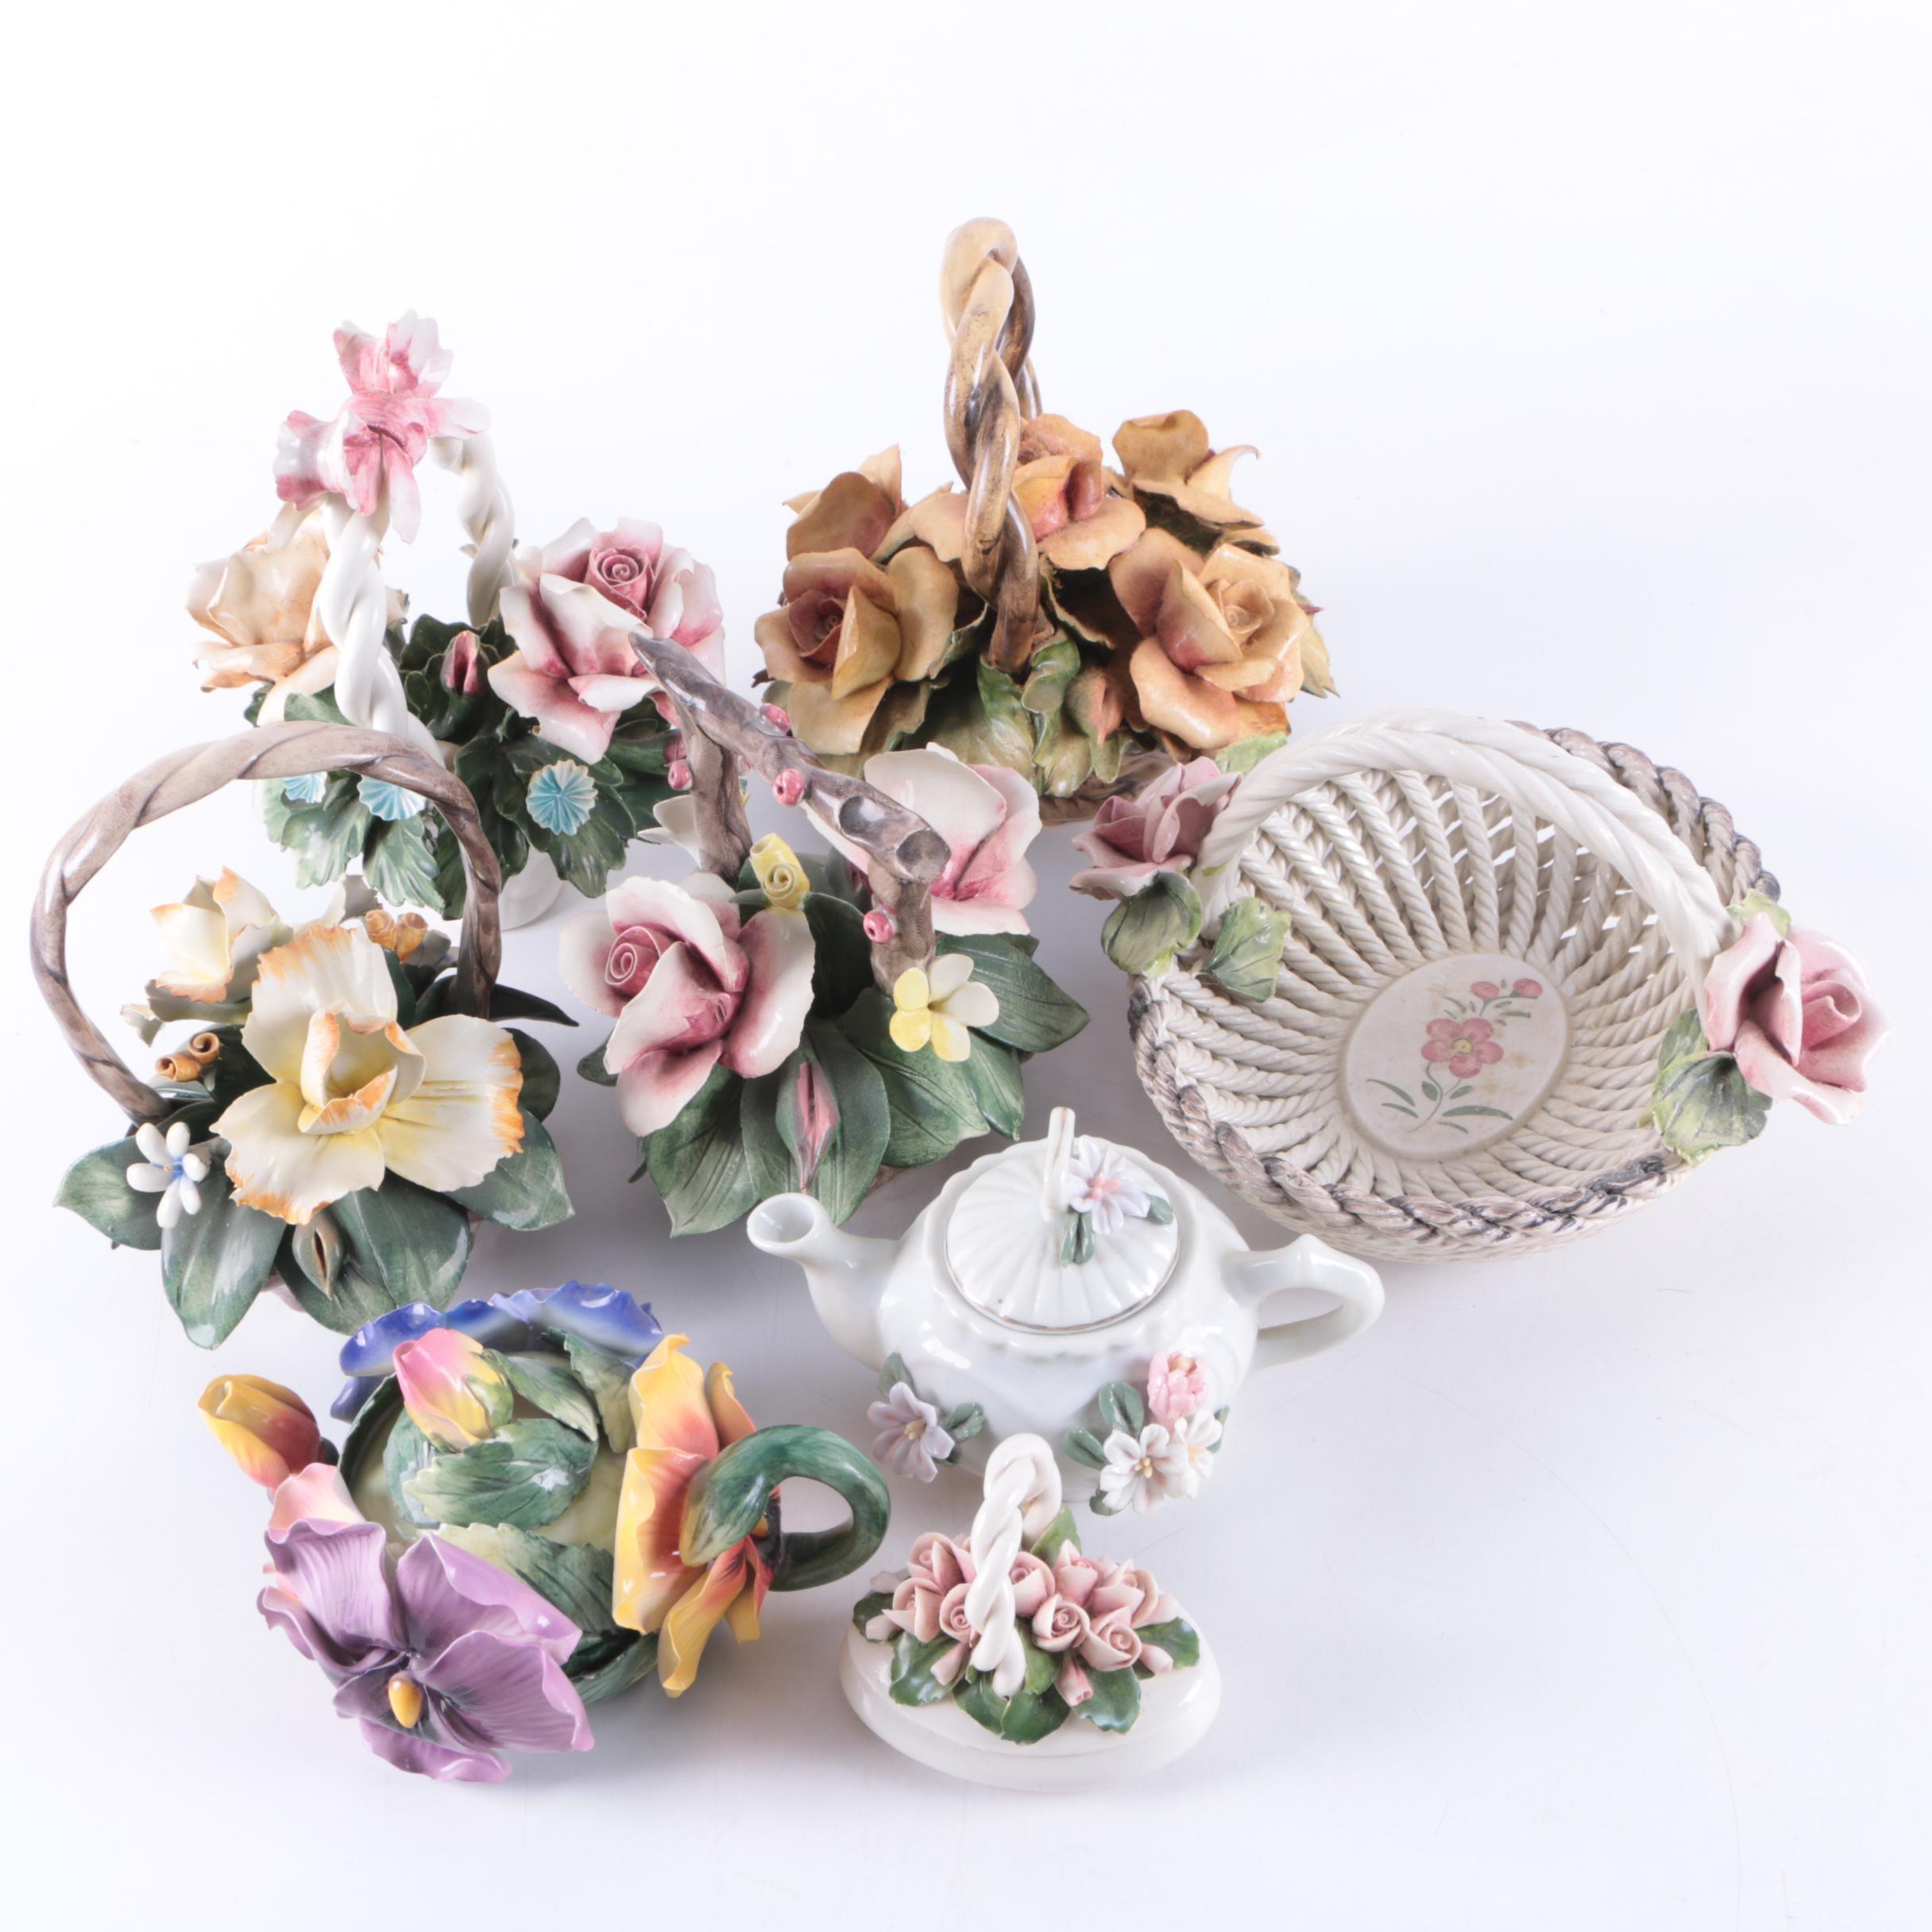 Porcelain Capodimonte Floral Bouquets and Serveware